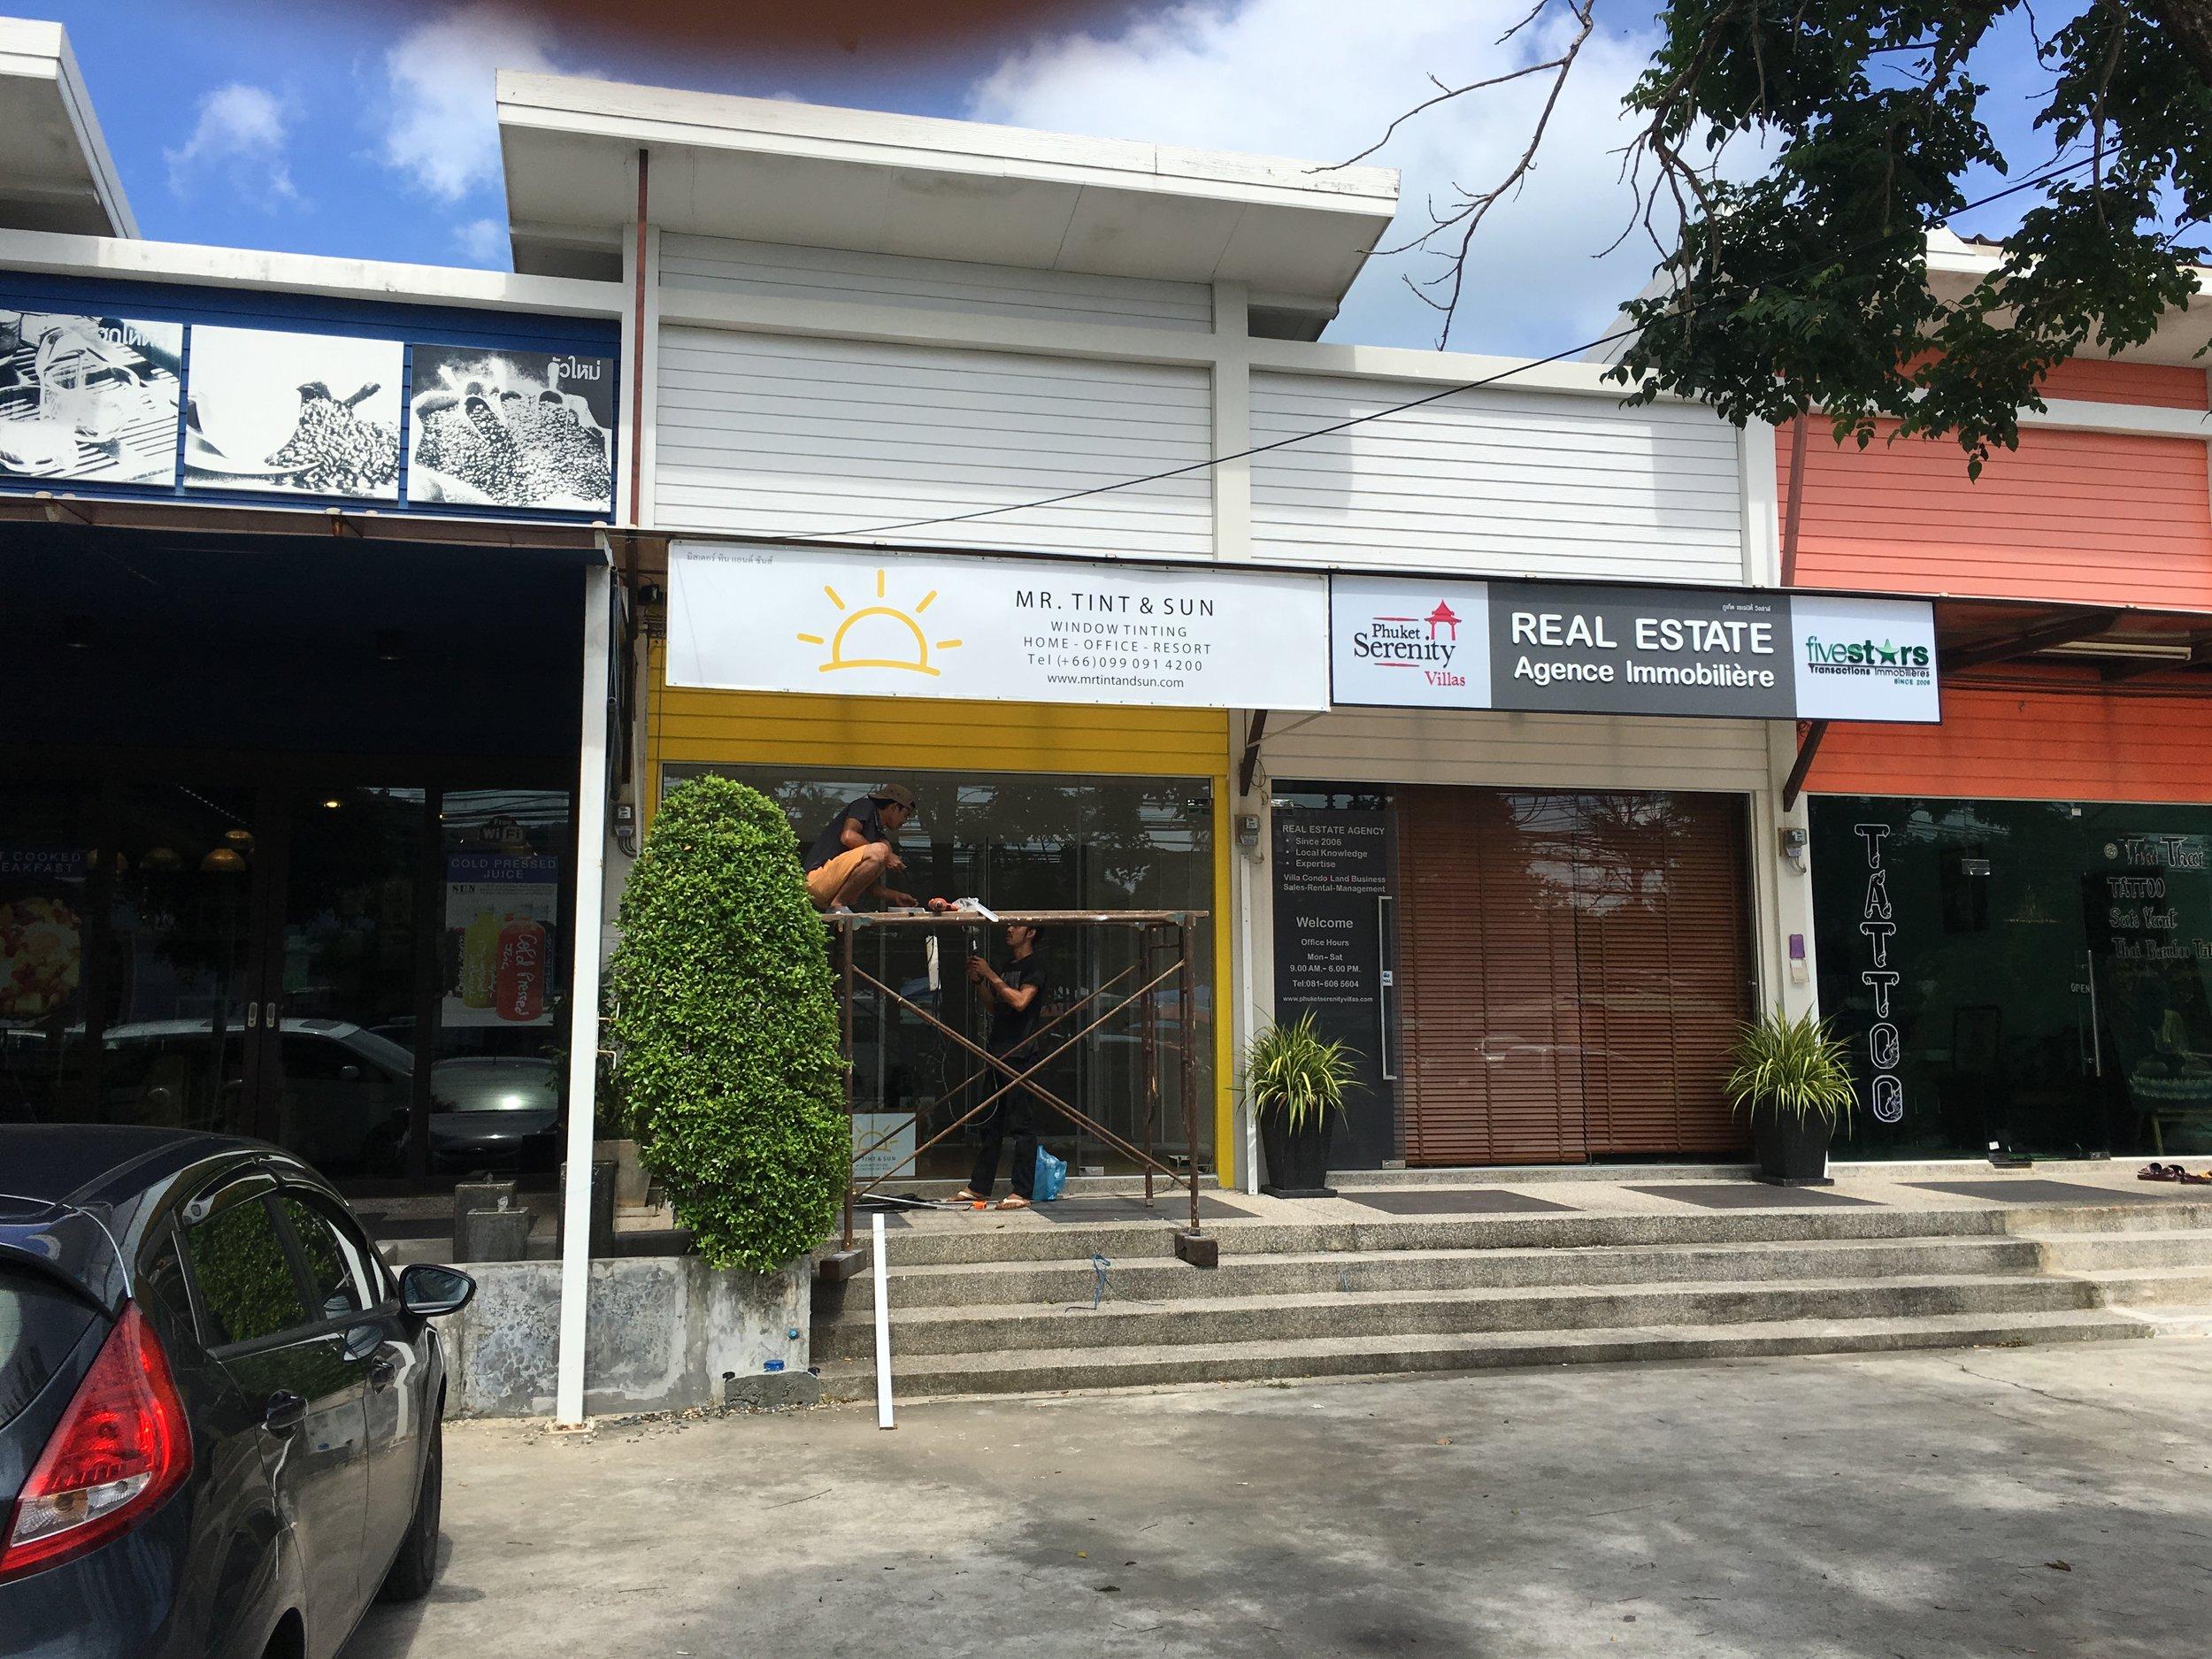 mr tint and sun window tinting phuket     THE DIGITAL WINDOW TINTING (THAILAND)